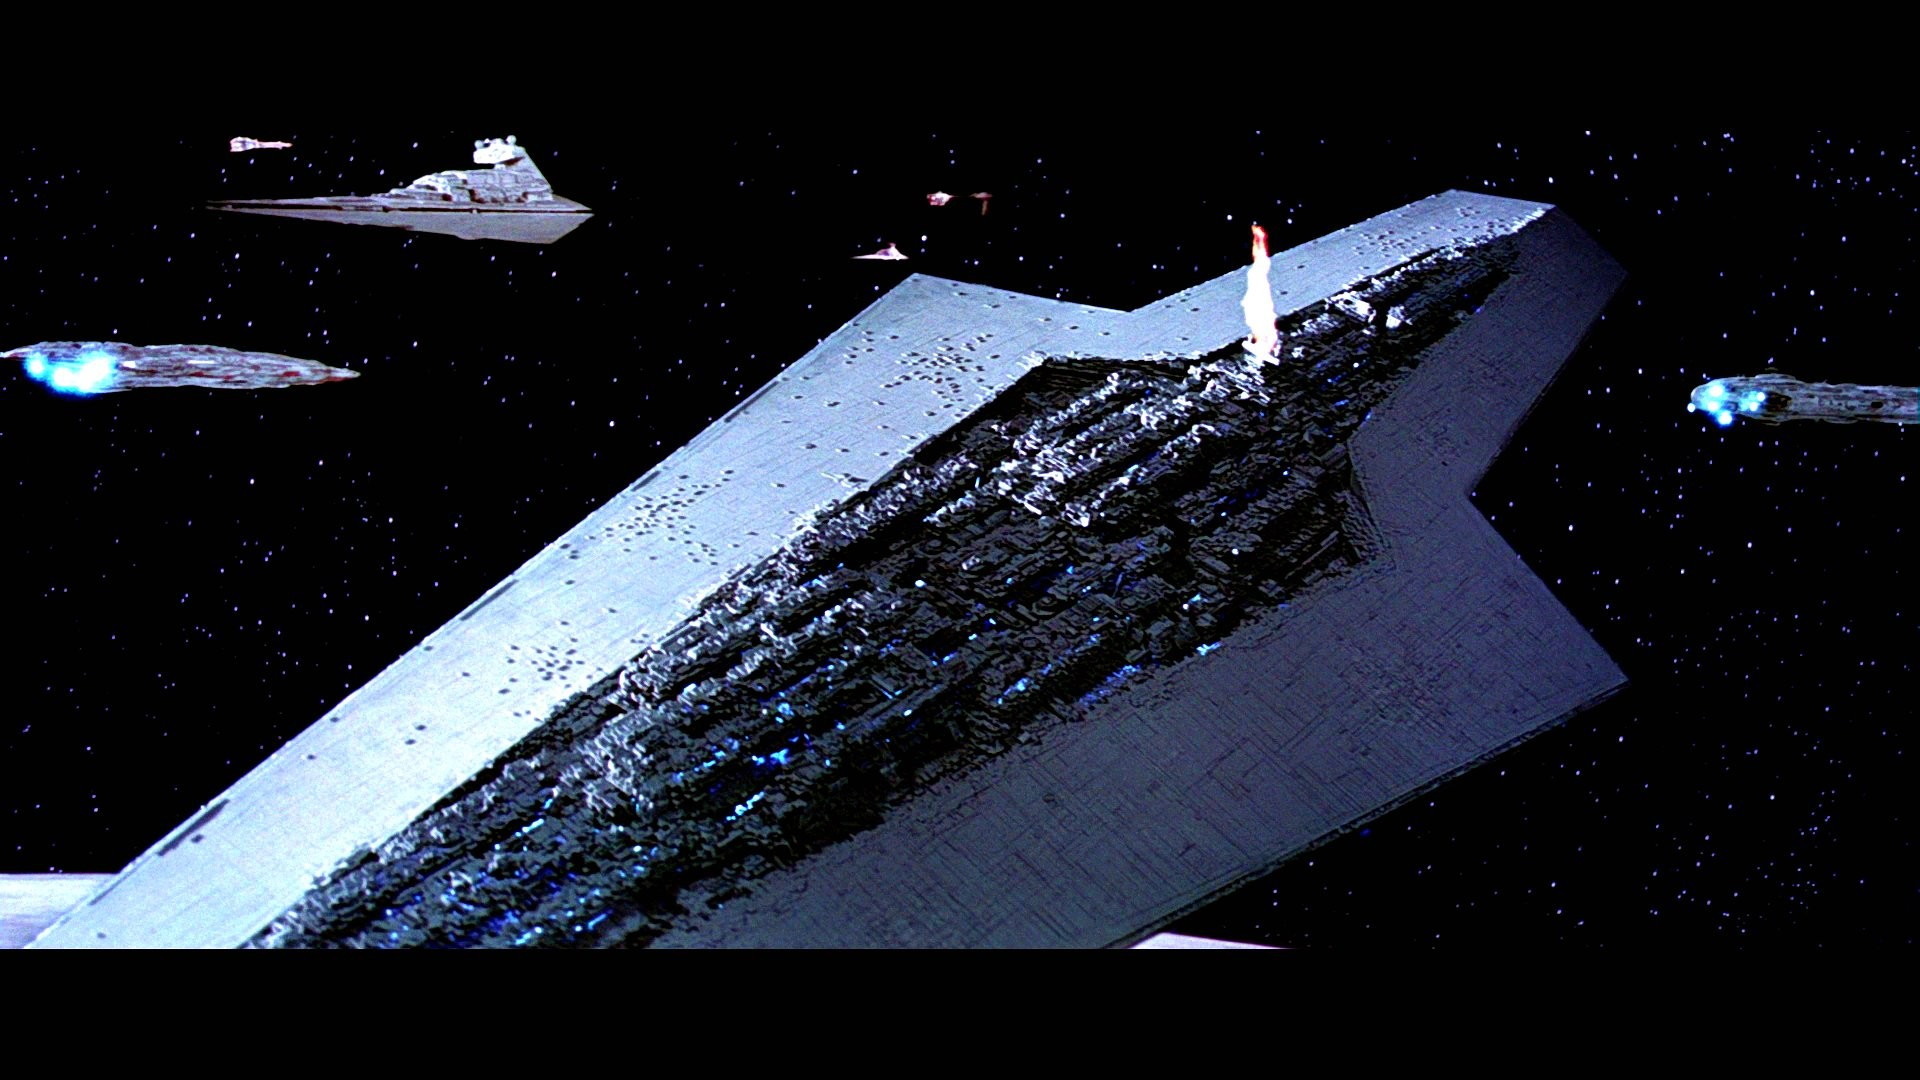 Super Star Destroyer 1920x1080 Wallpaper Teahub Io